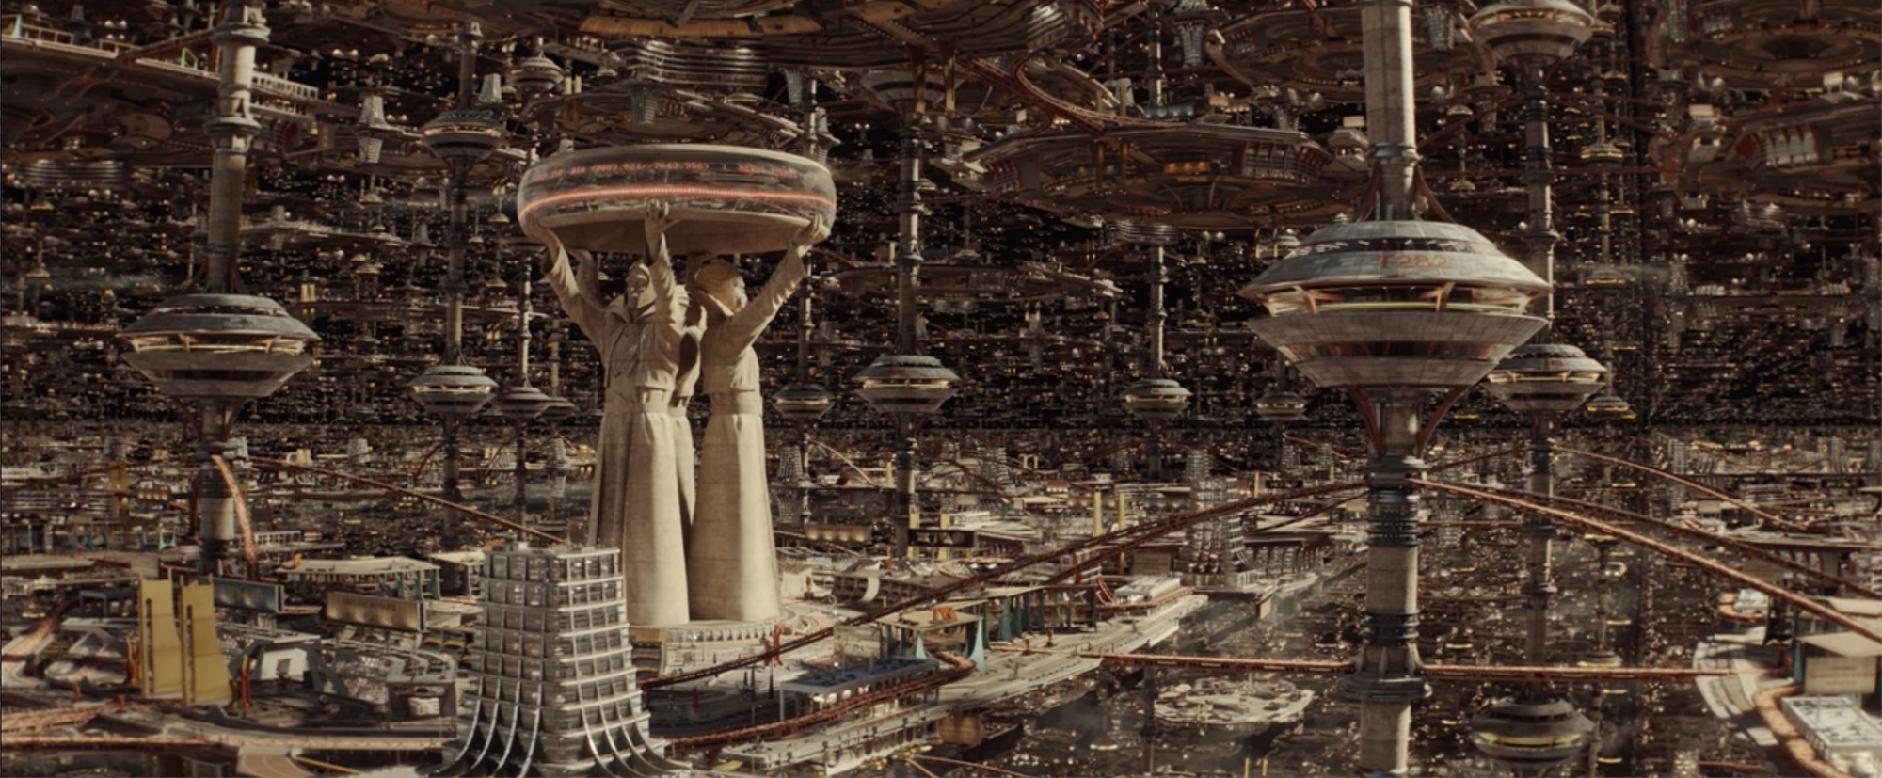 Cityscape of the TVA